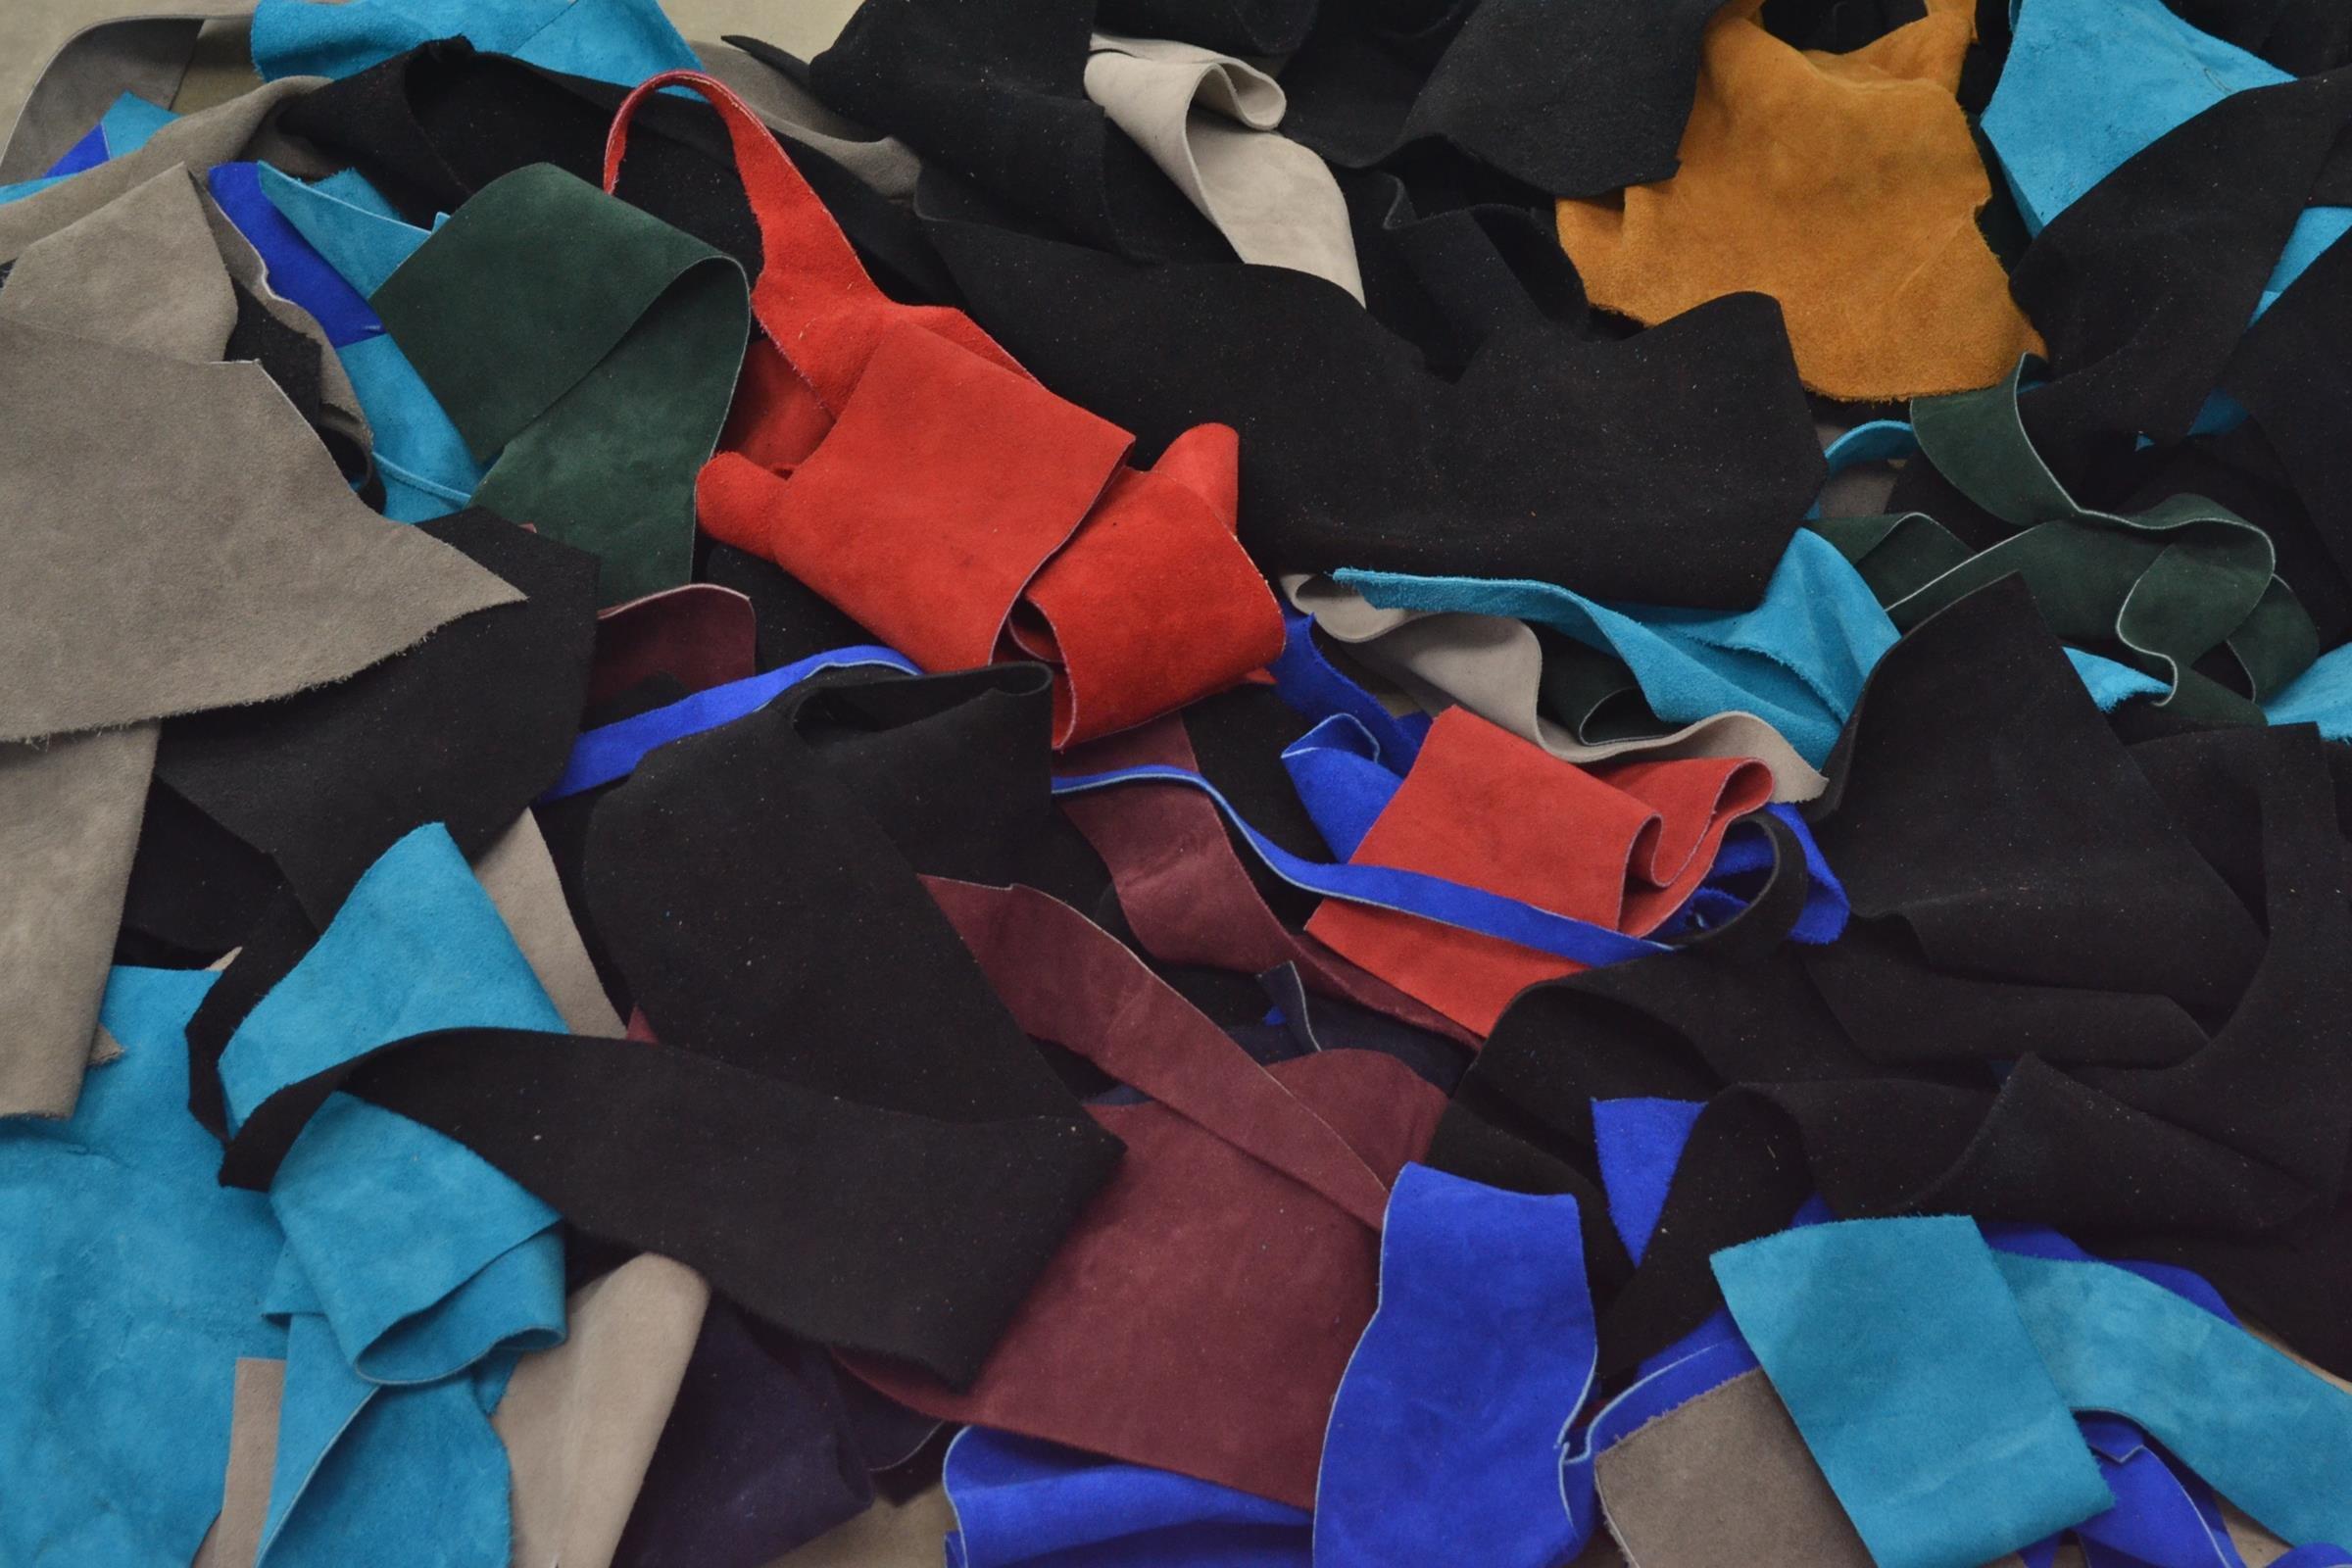 Cow Leather Scrap Multi Color Suede 3-5oz Hide Pieces 1 Pound 1/2-2 sf